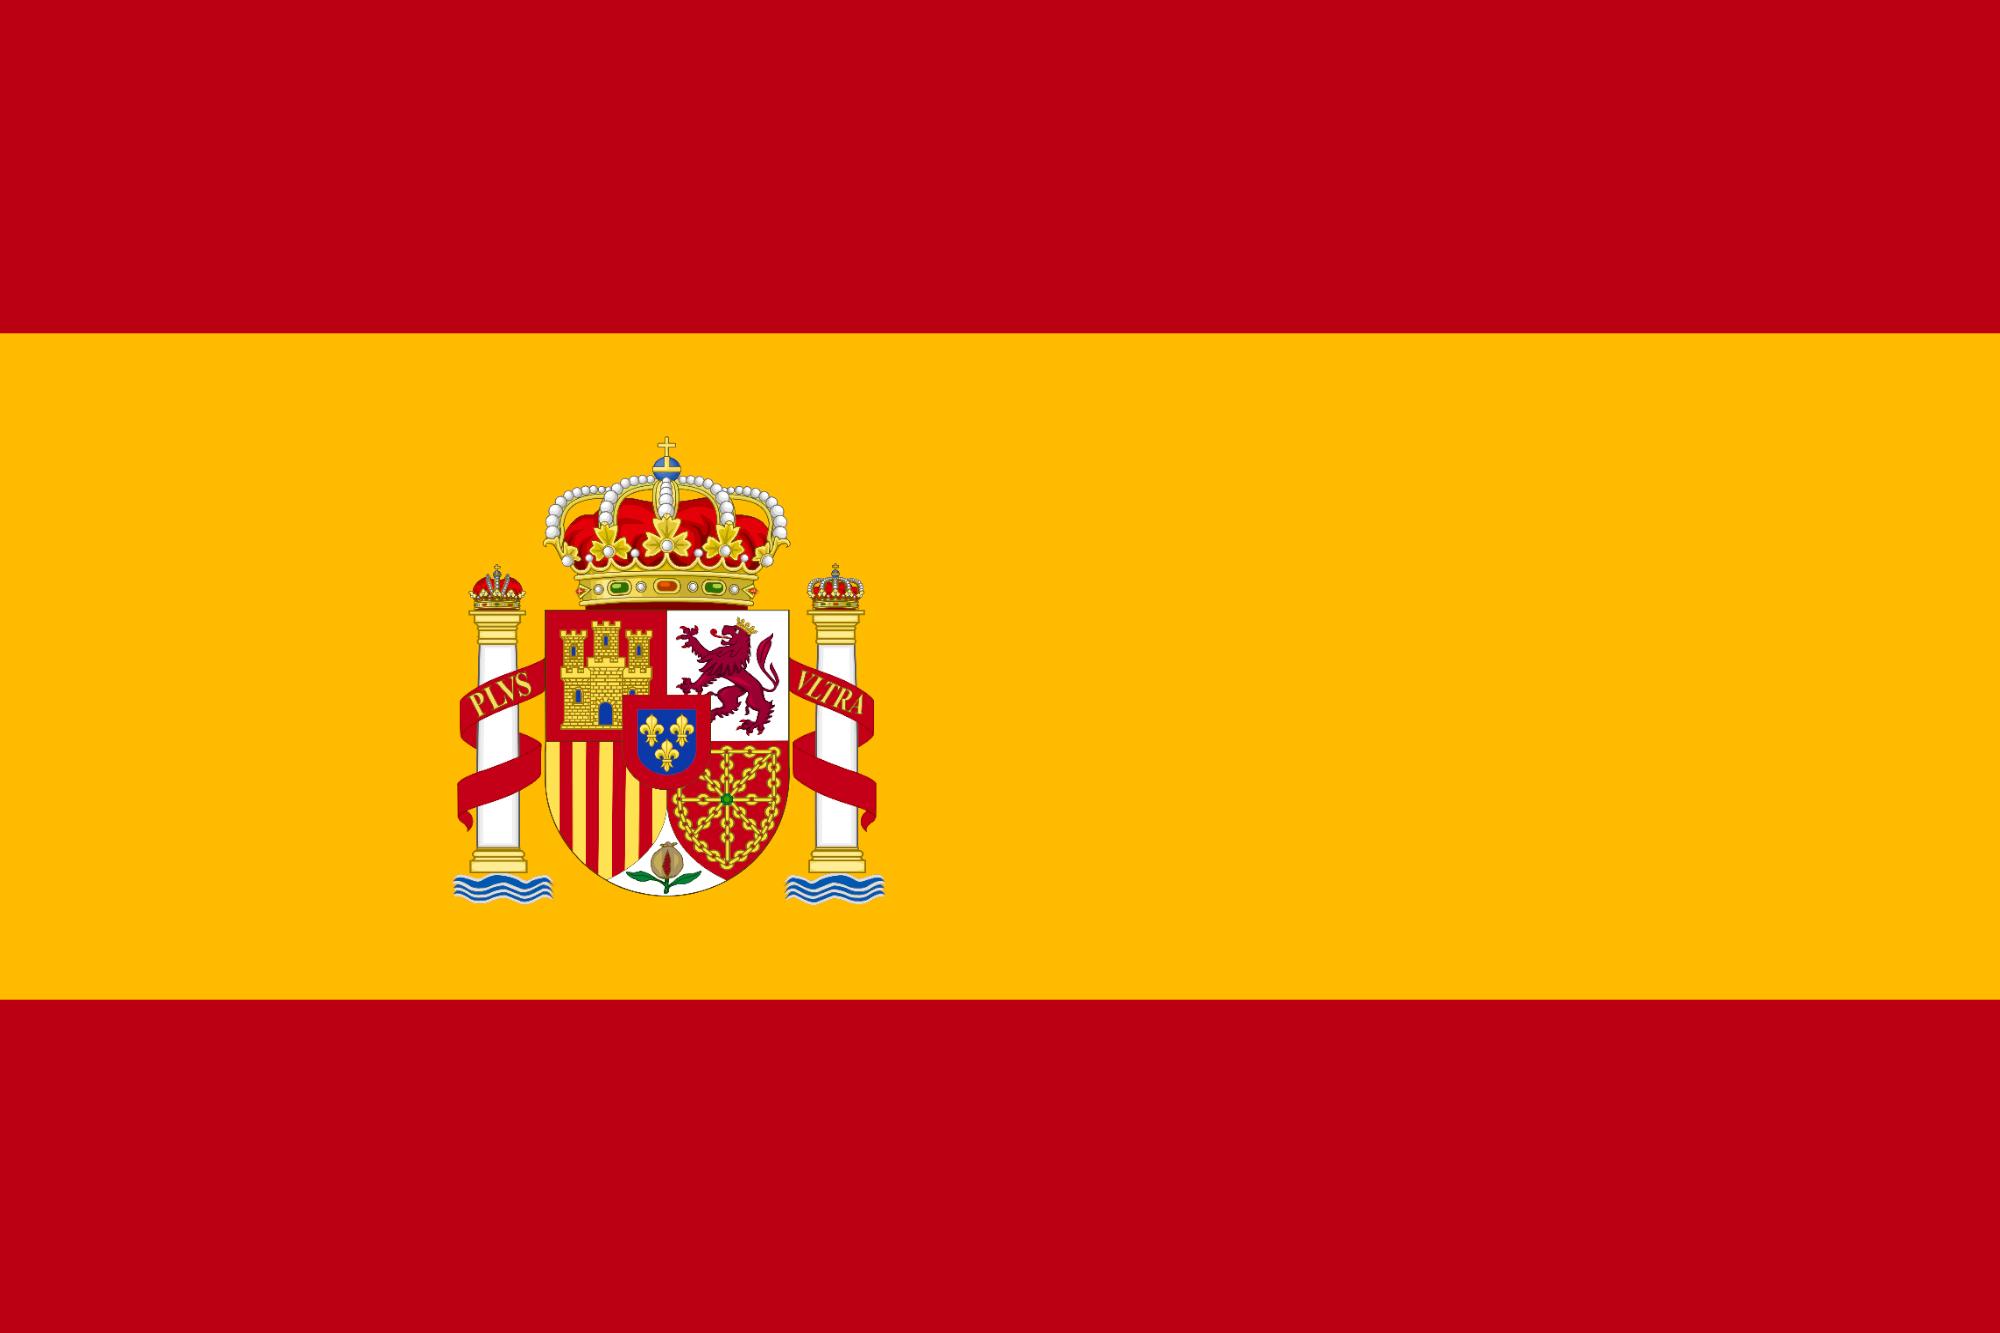 flag of spain 8 image monarchy flags mod for hearts of iron iii rh moddb com spain flag emblem meaning spain flag logo vector